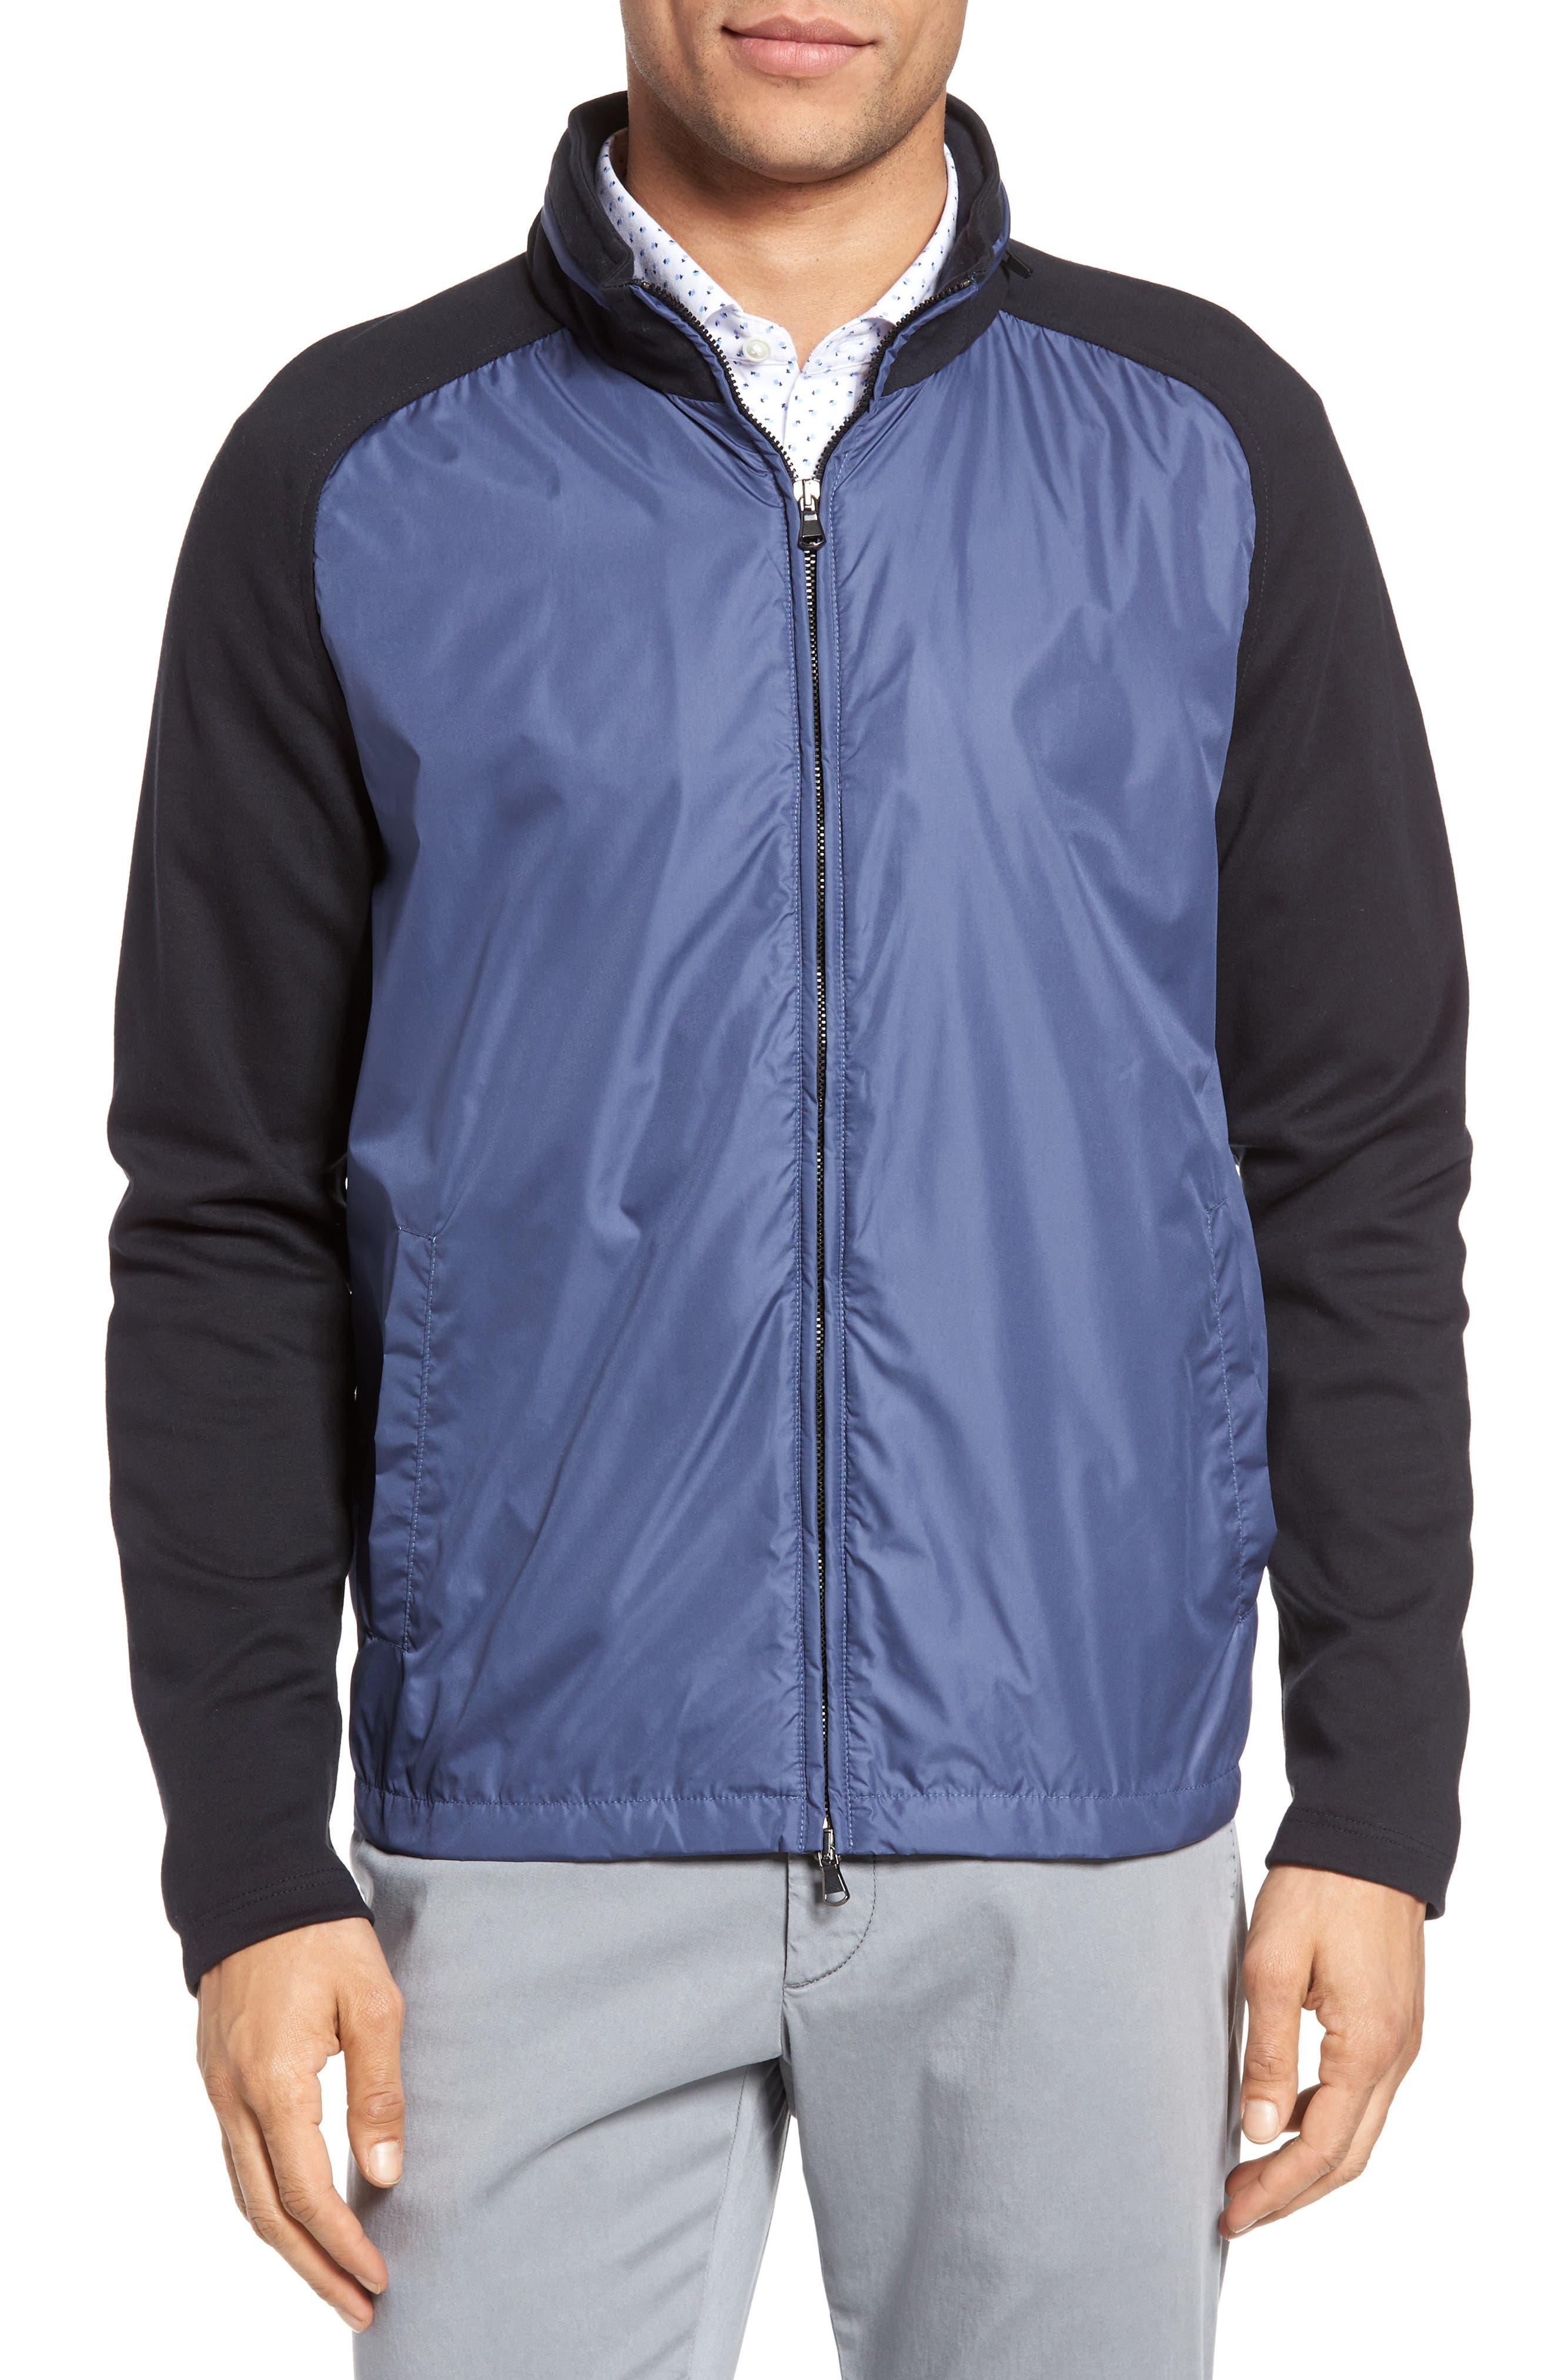 Syconium Mixed Media Zip Front Jacket,                         Main,                         color, Blue